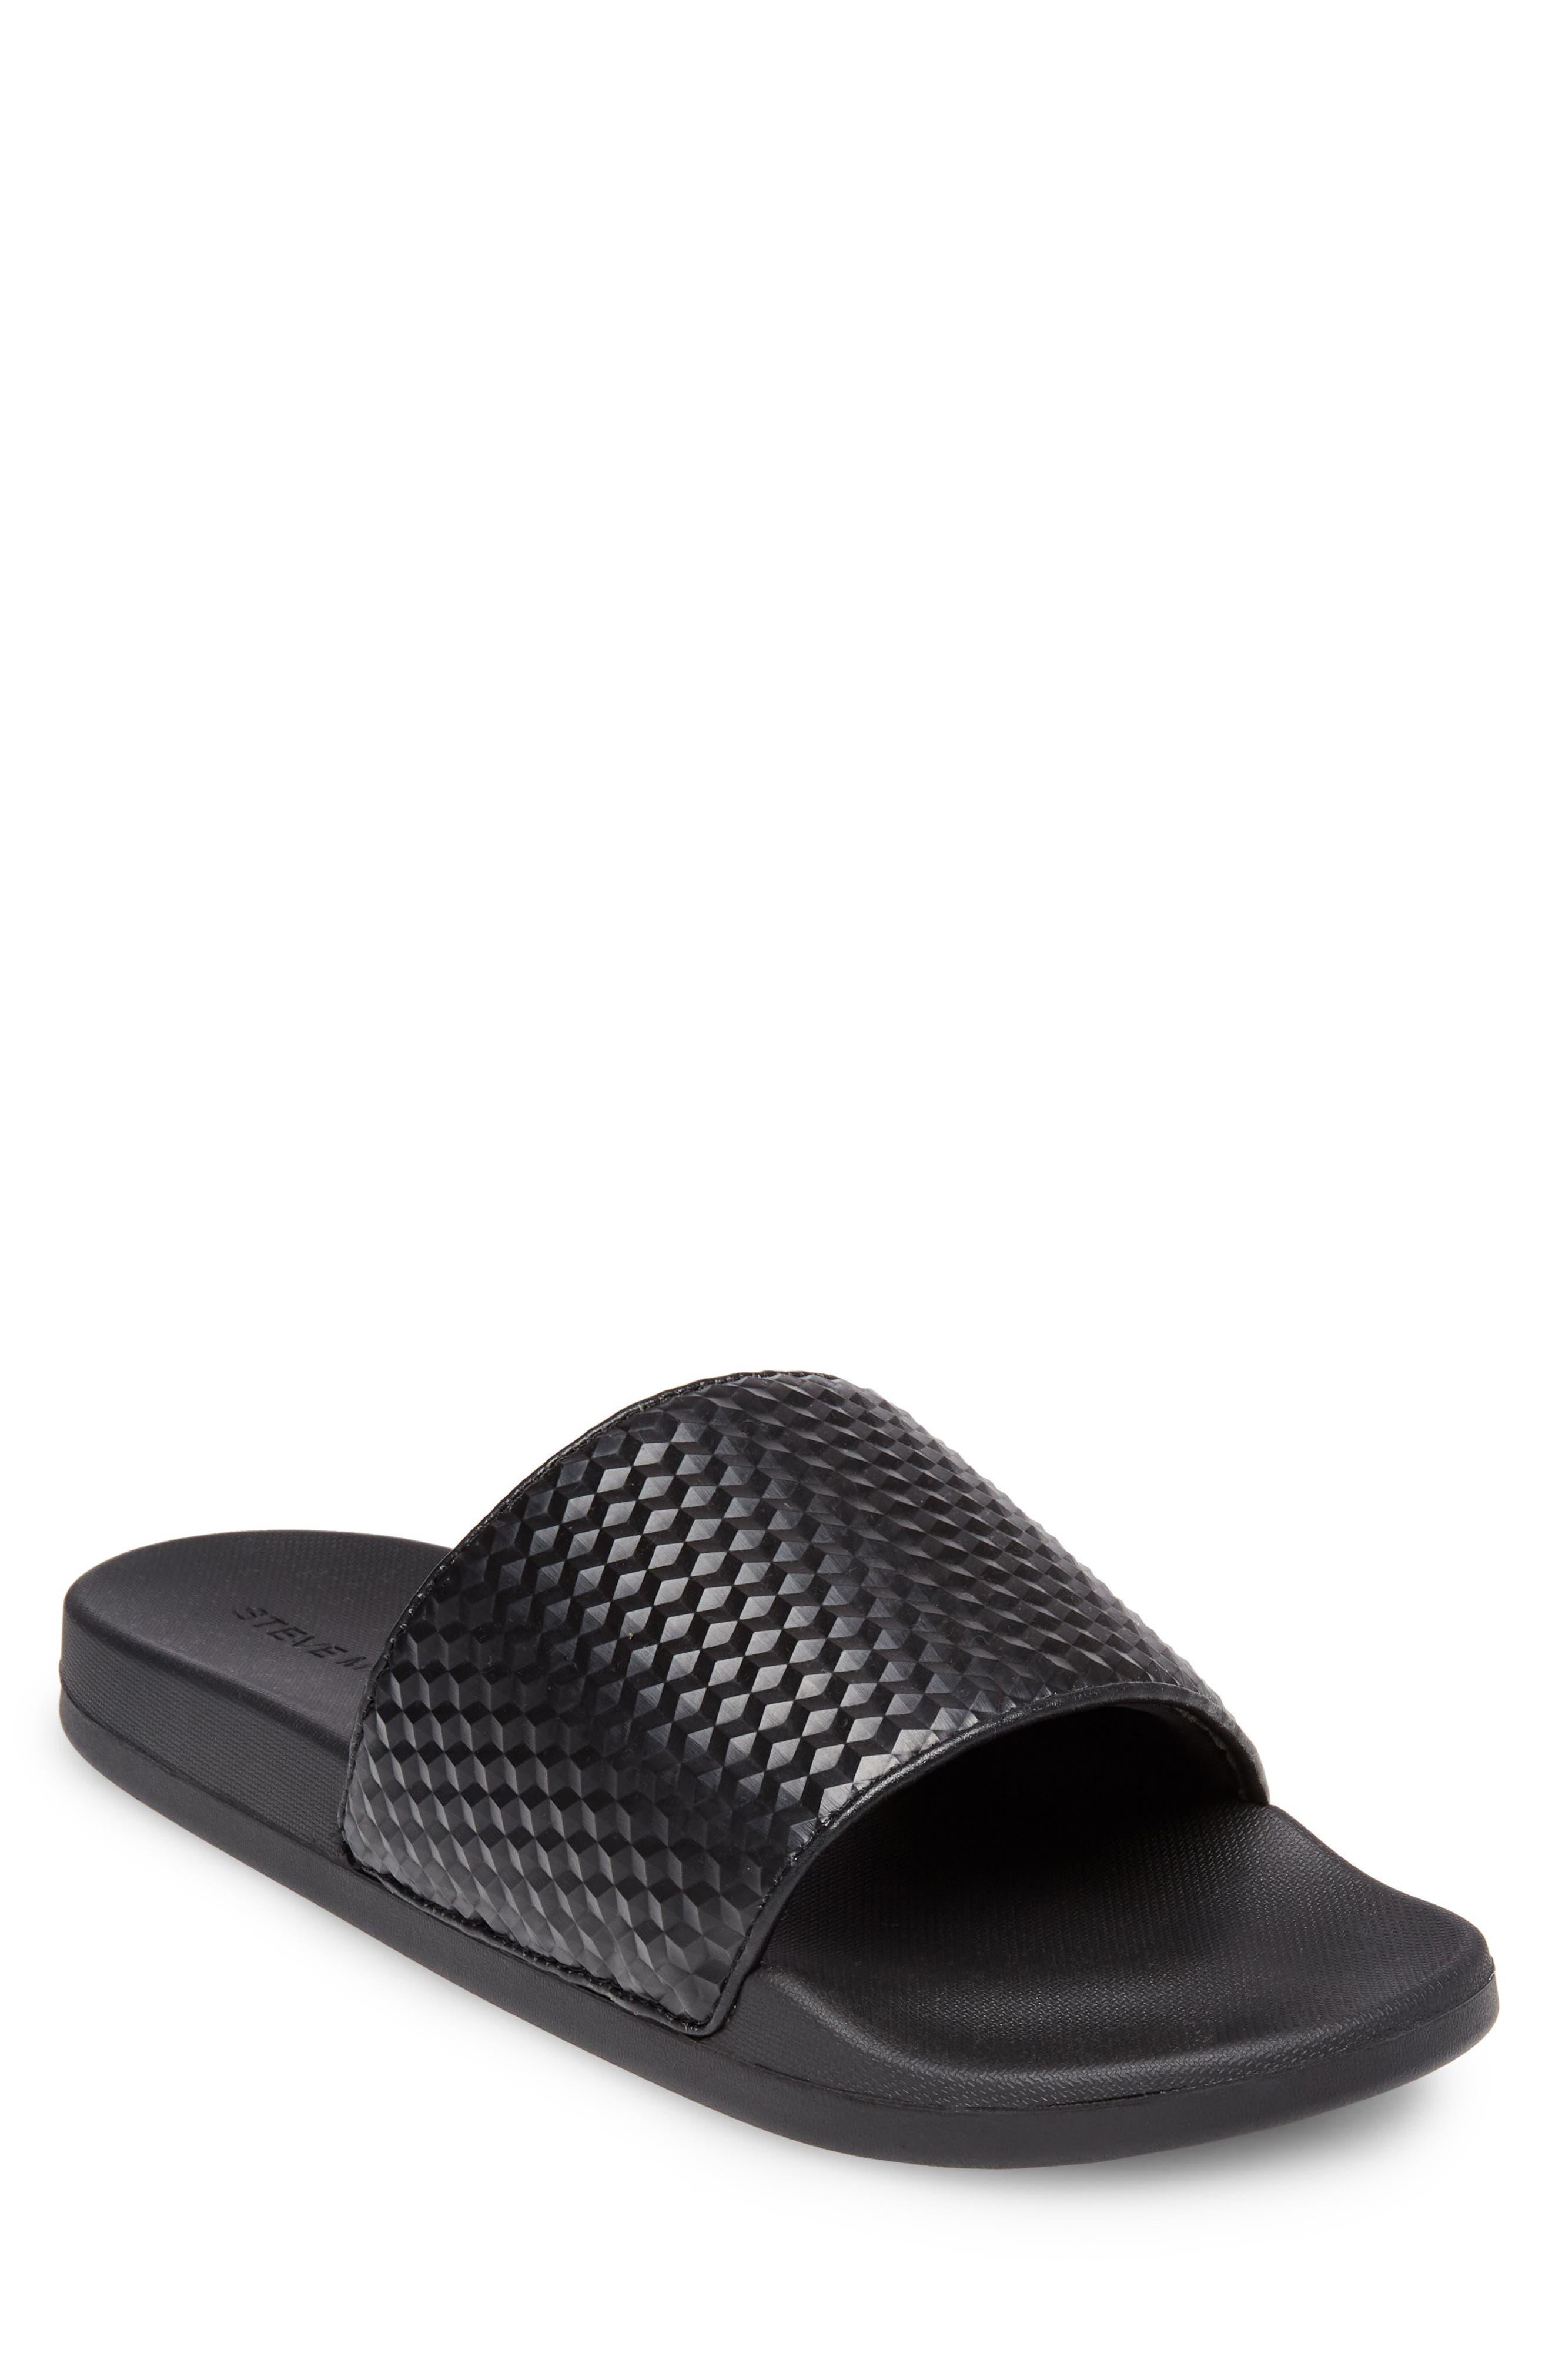 Riptide Slide Sandal,                         Main,                         color, 001